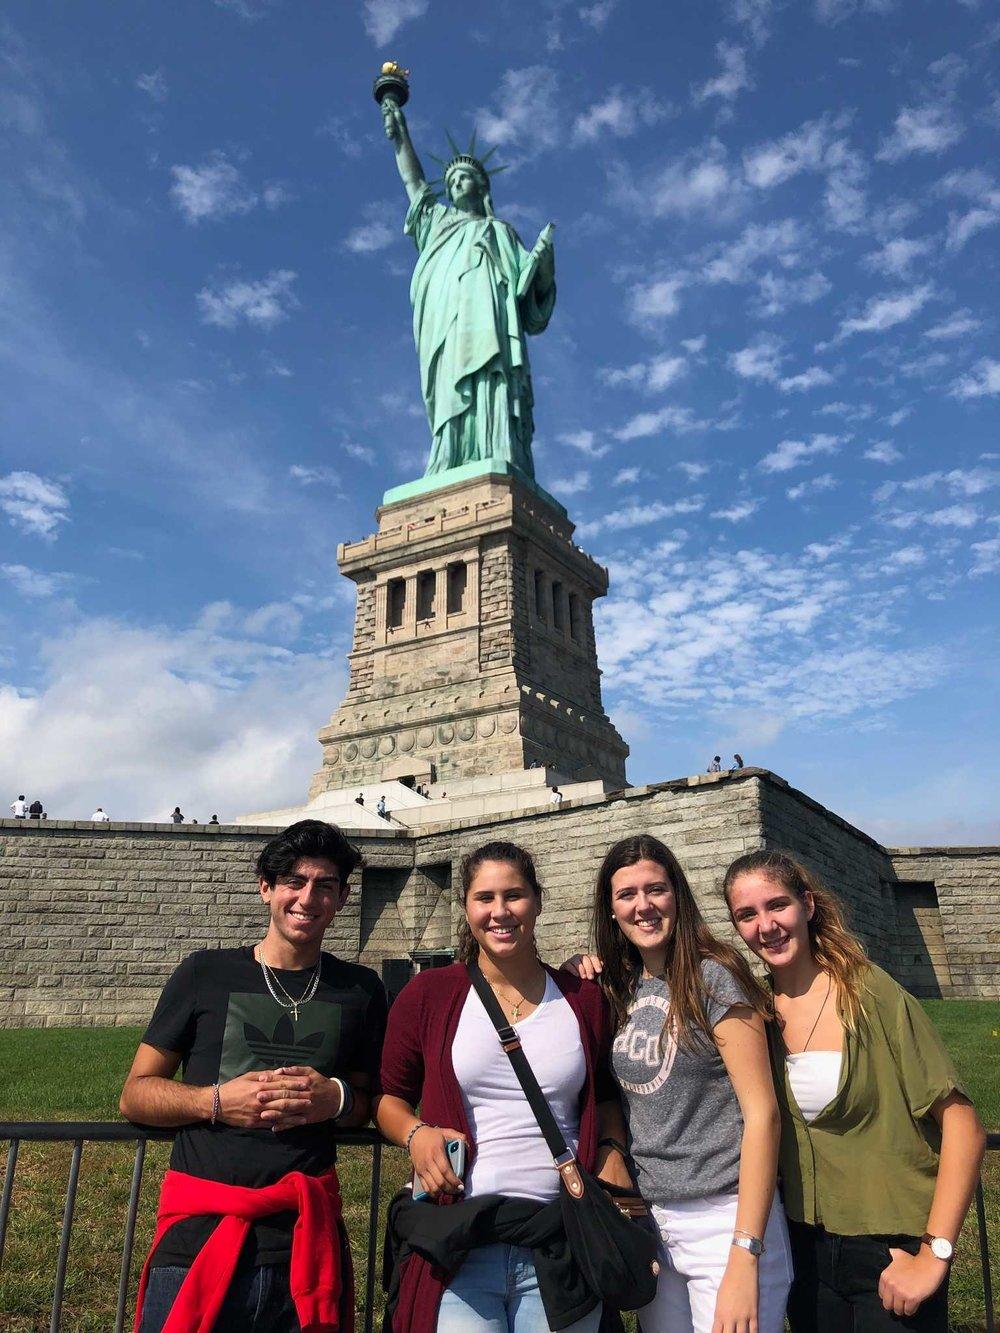 statue of liberty 3.jpg